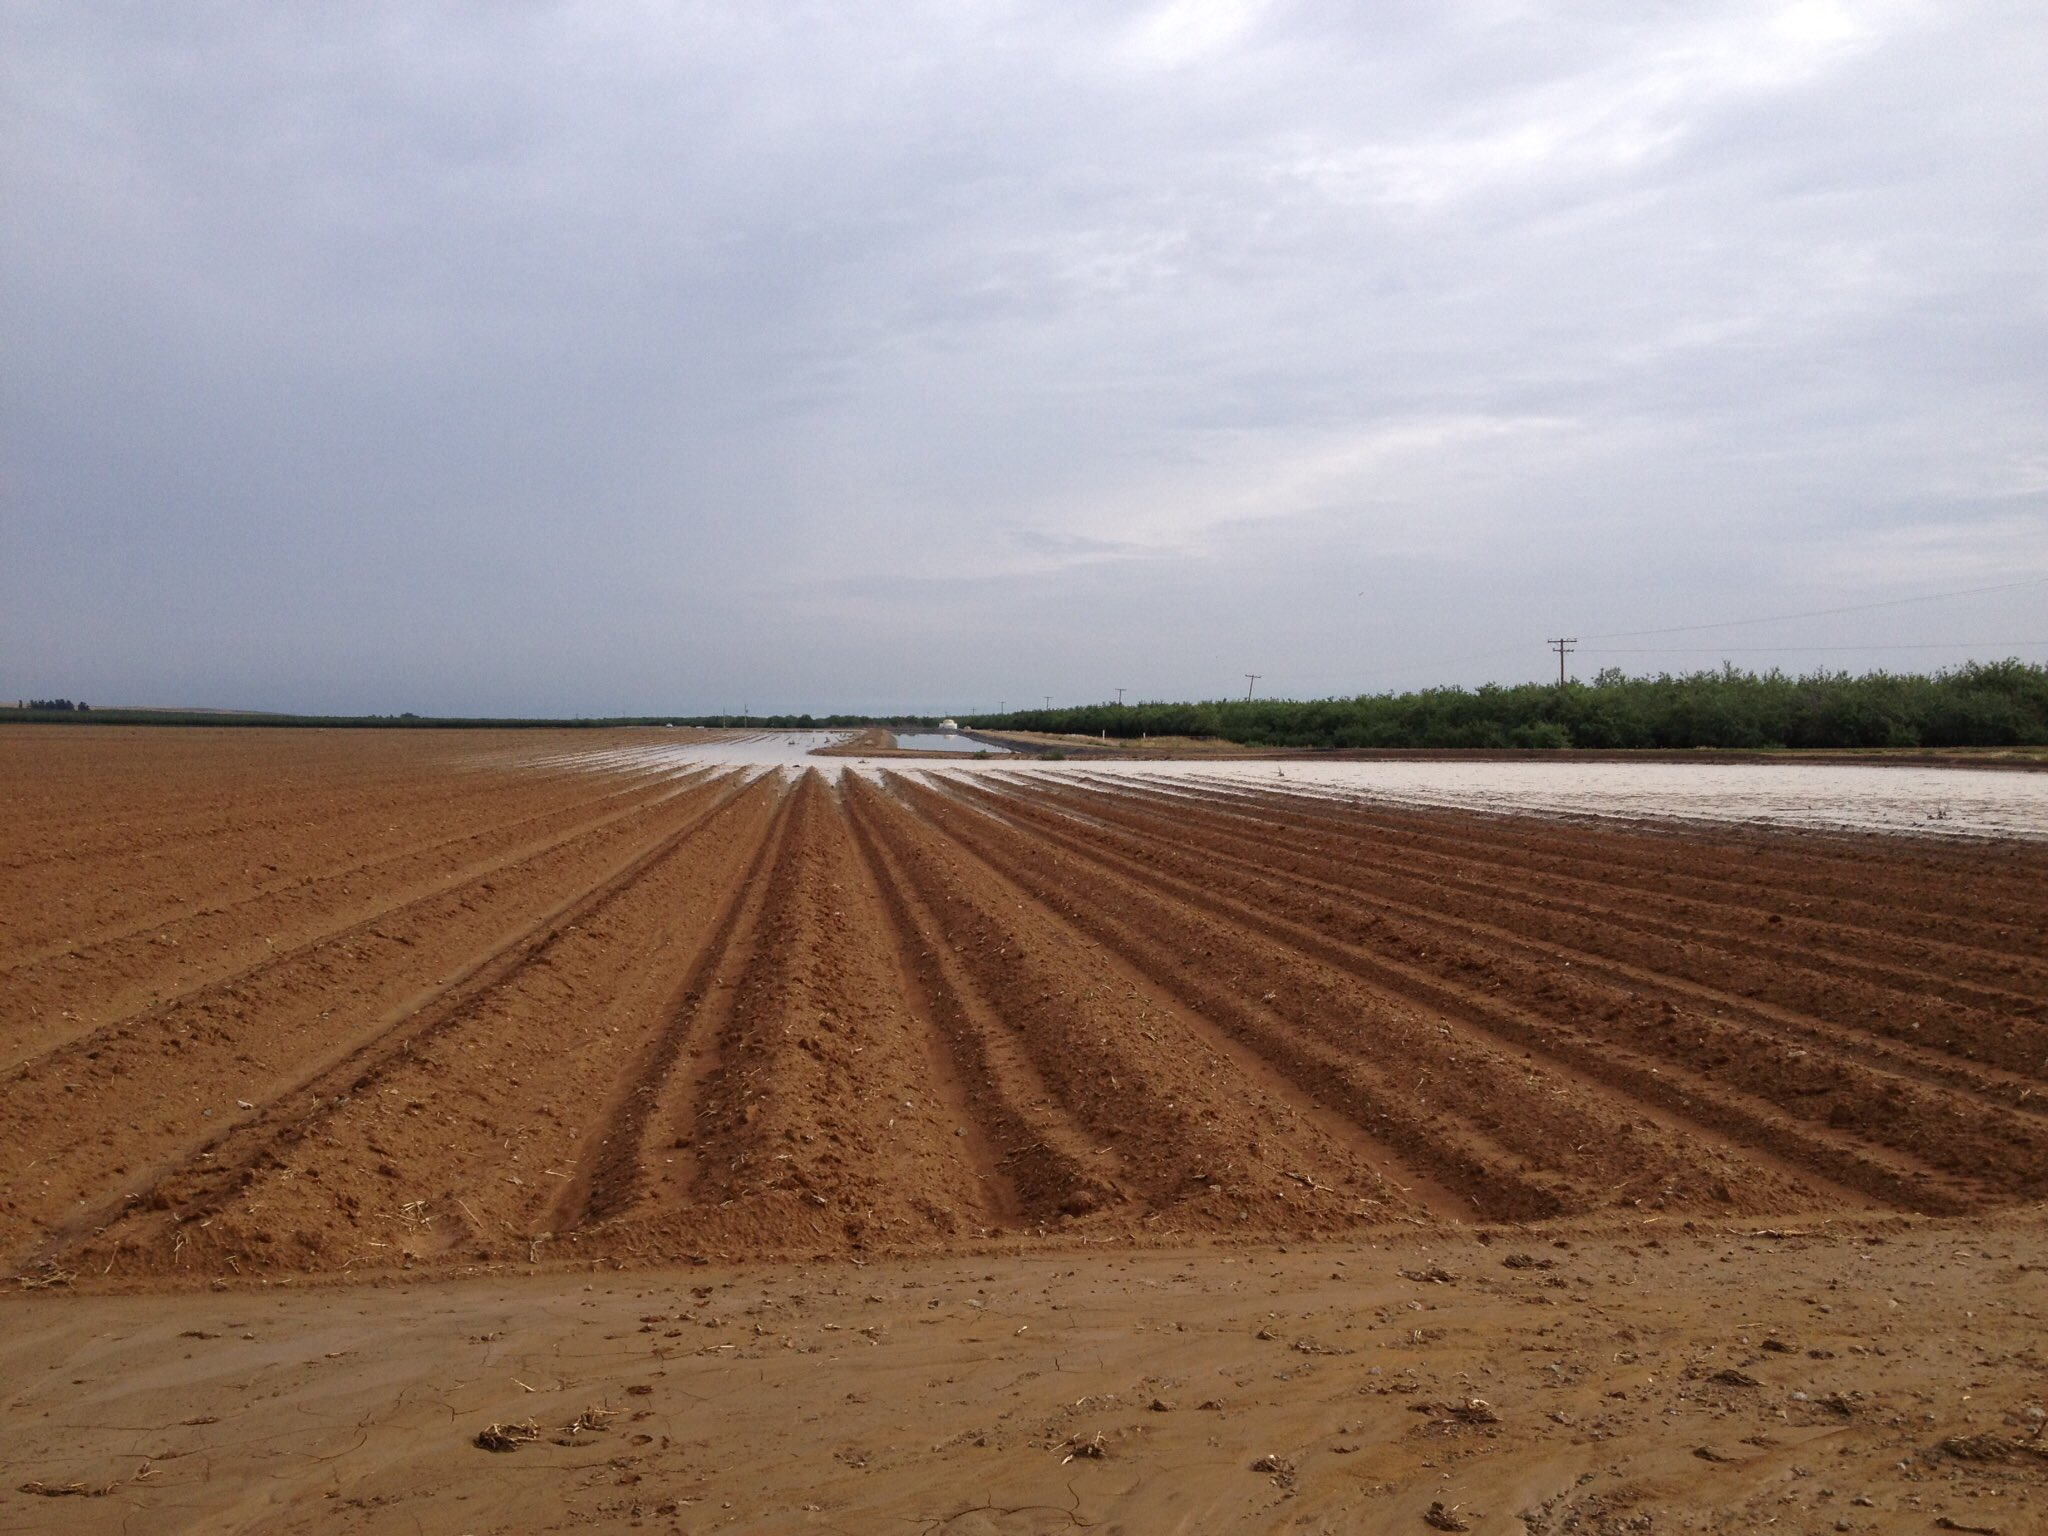 #Flooding on the #farm from Thursday's storm. #ElNino #SanJoaquinValley https://t.co/BYubZPO71R